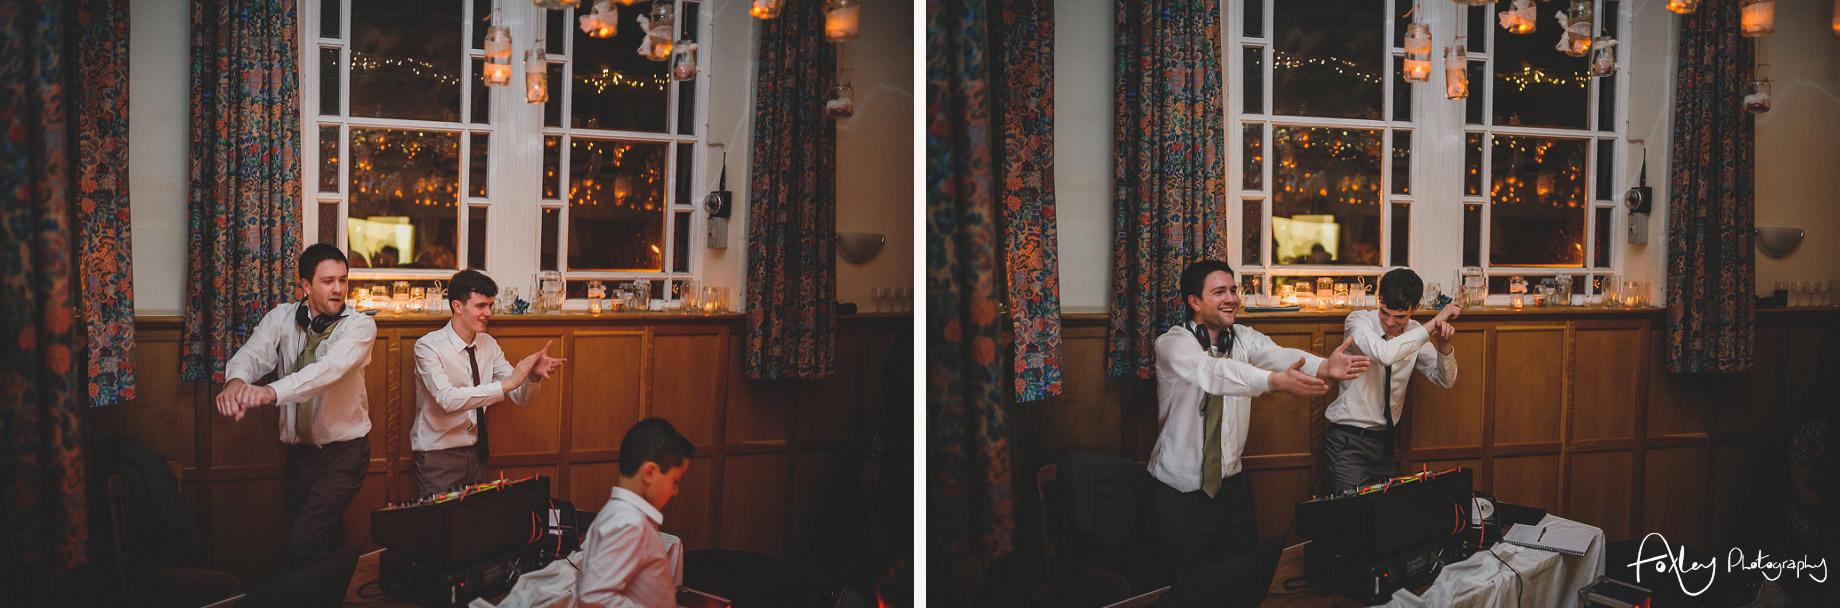 Mel-and-Lewis-Wedding-at-Barley-Village-Hall-210